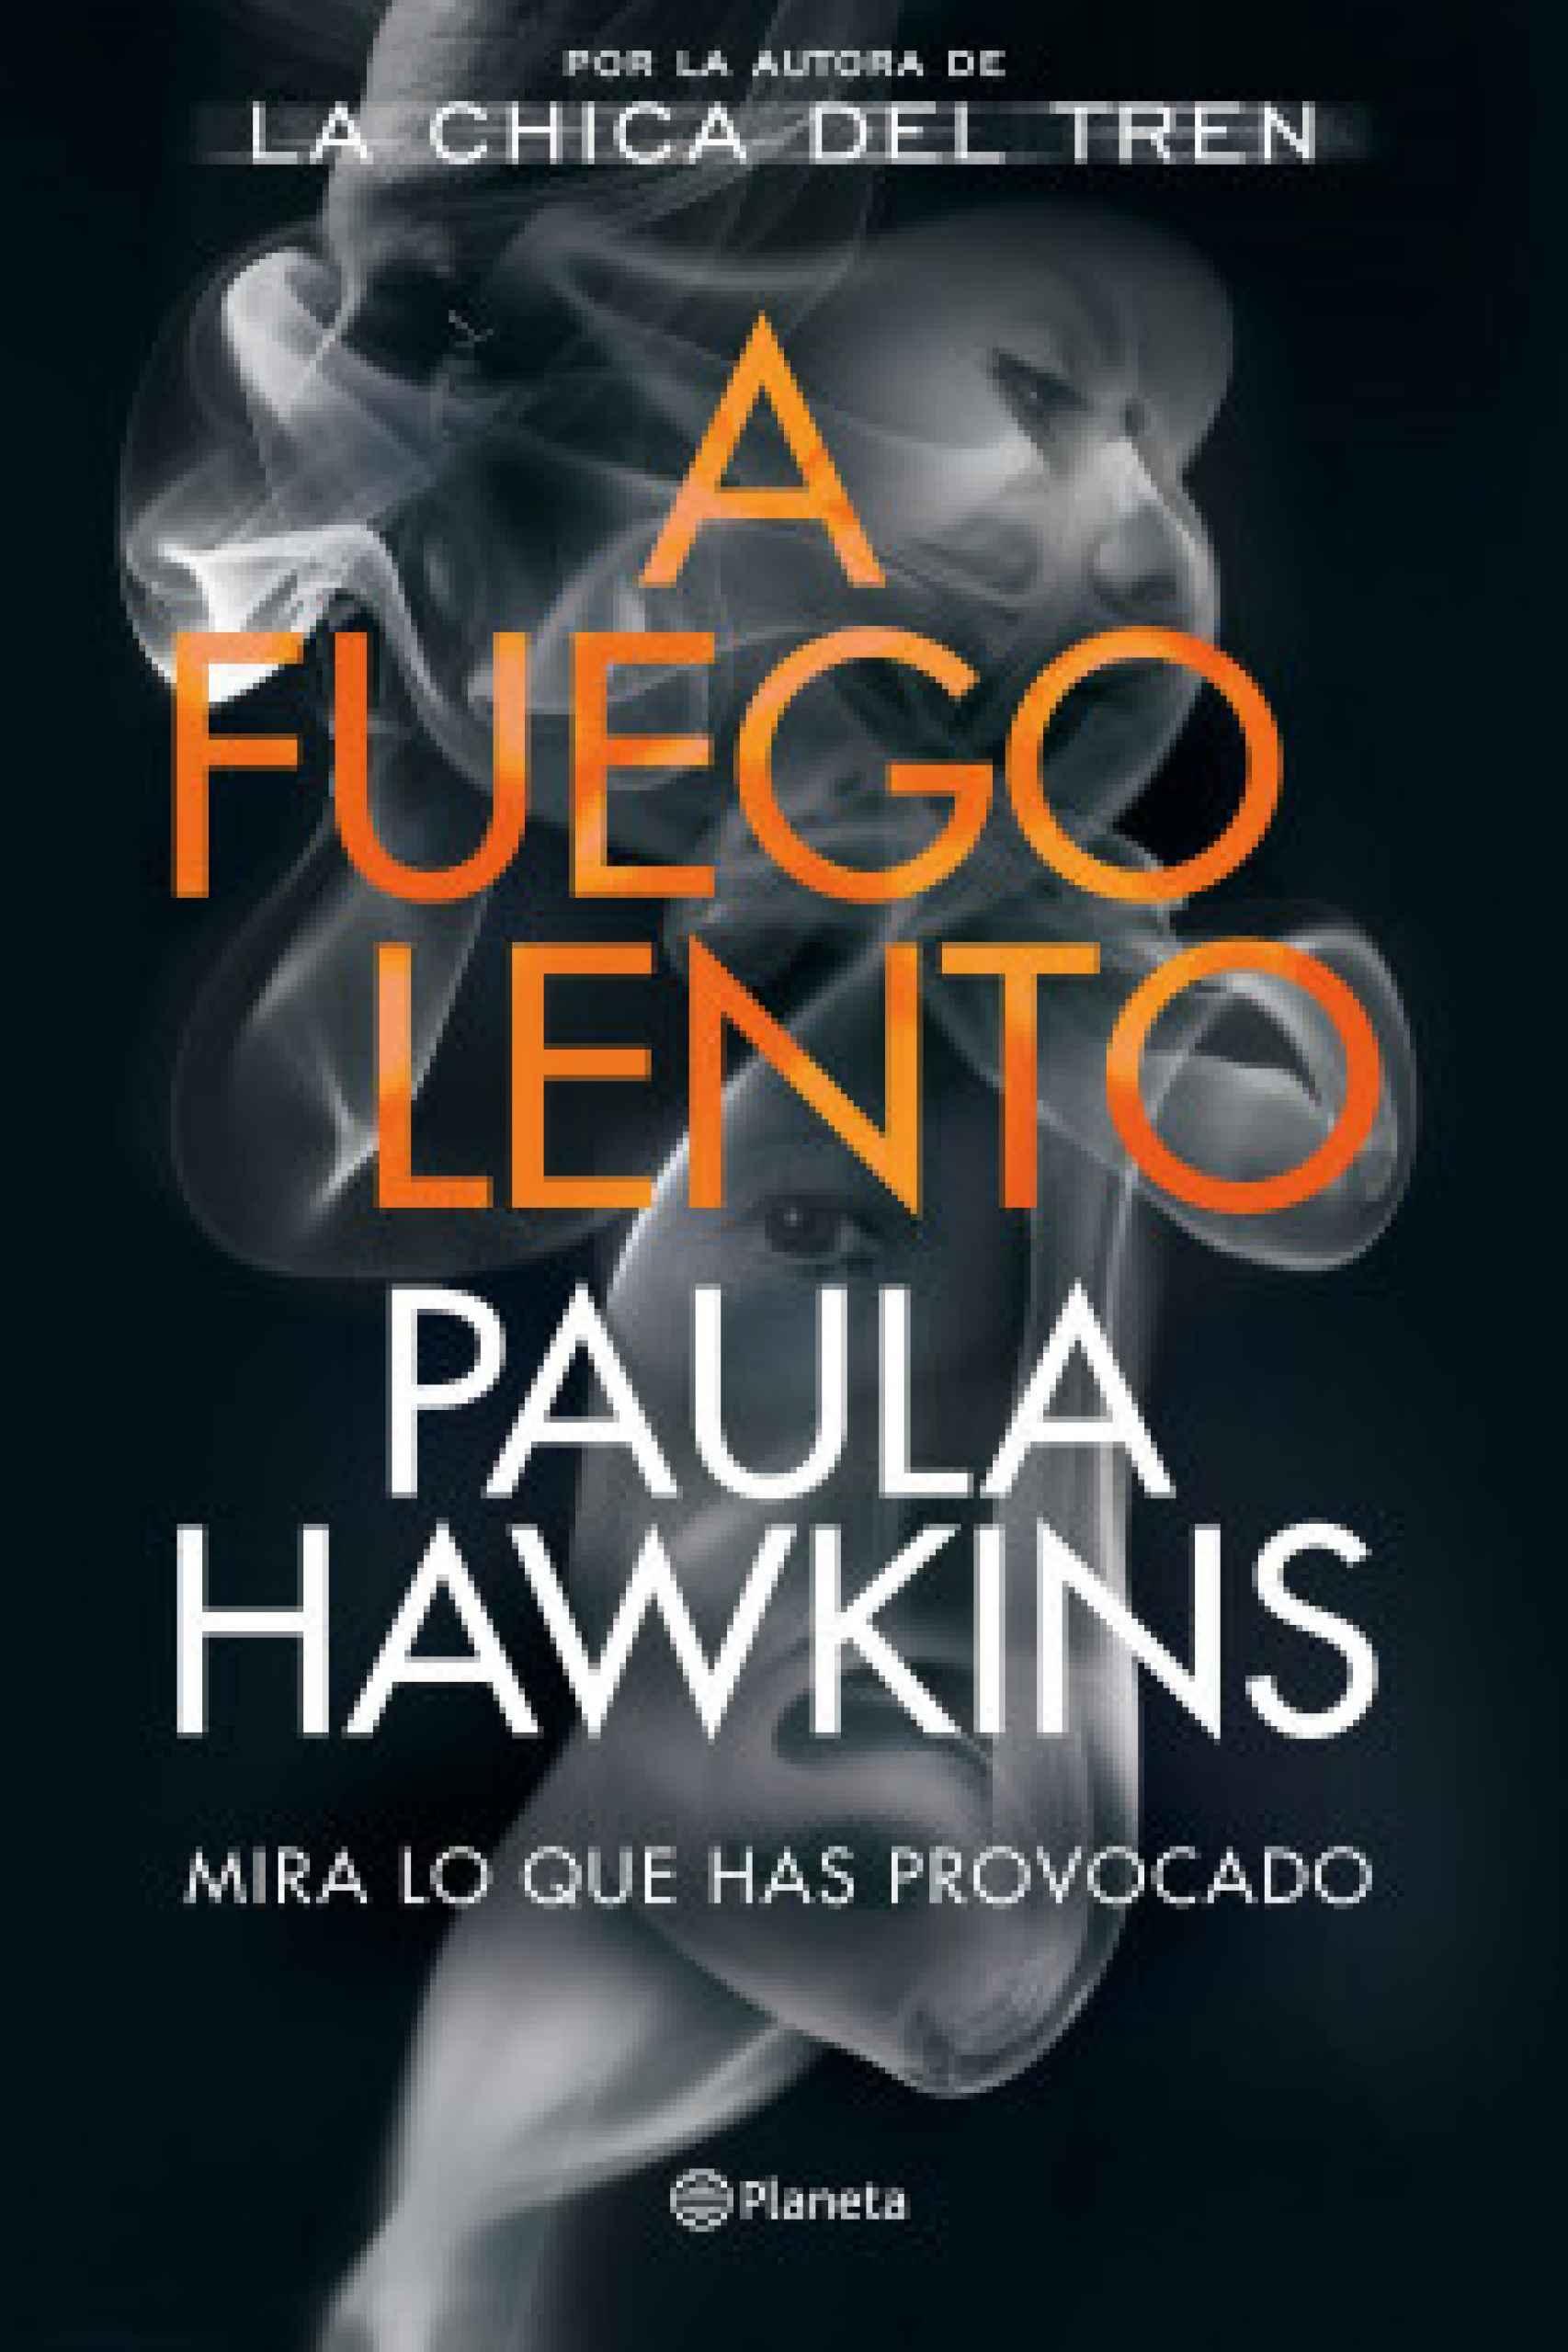 A fuego lento (Paula Hawkins)